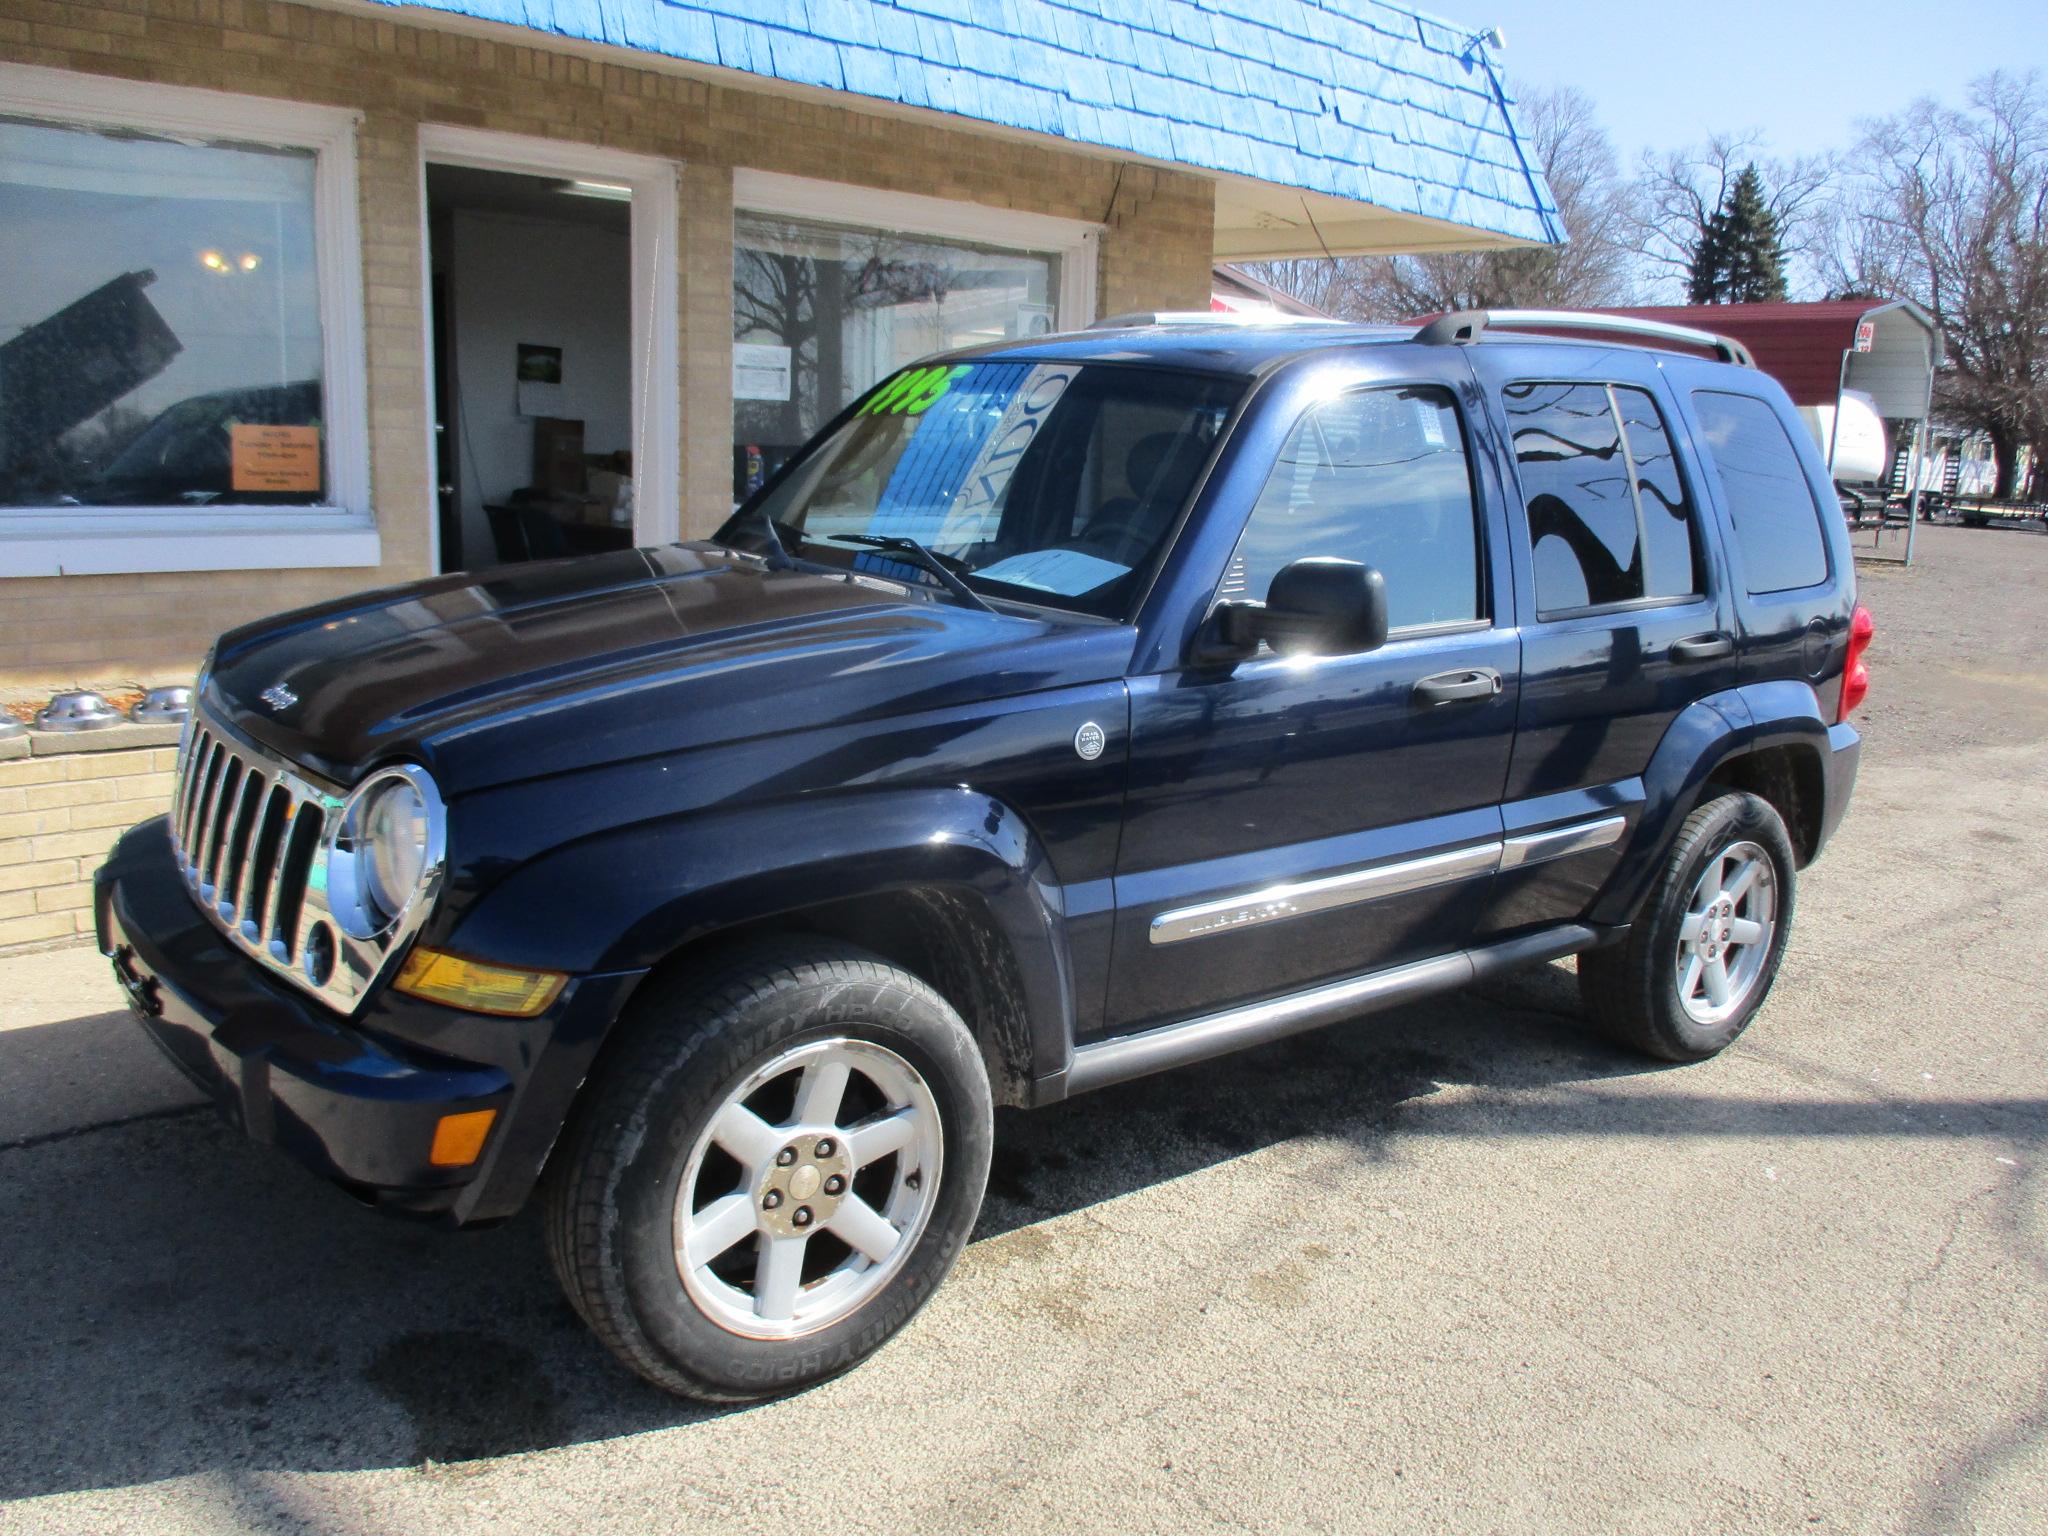 2006 Jeep Liberty 4 Door SUV   Limited